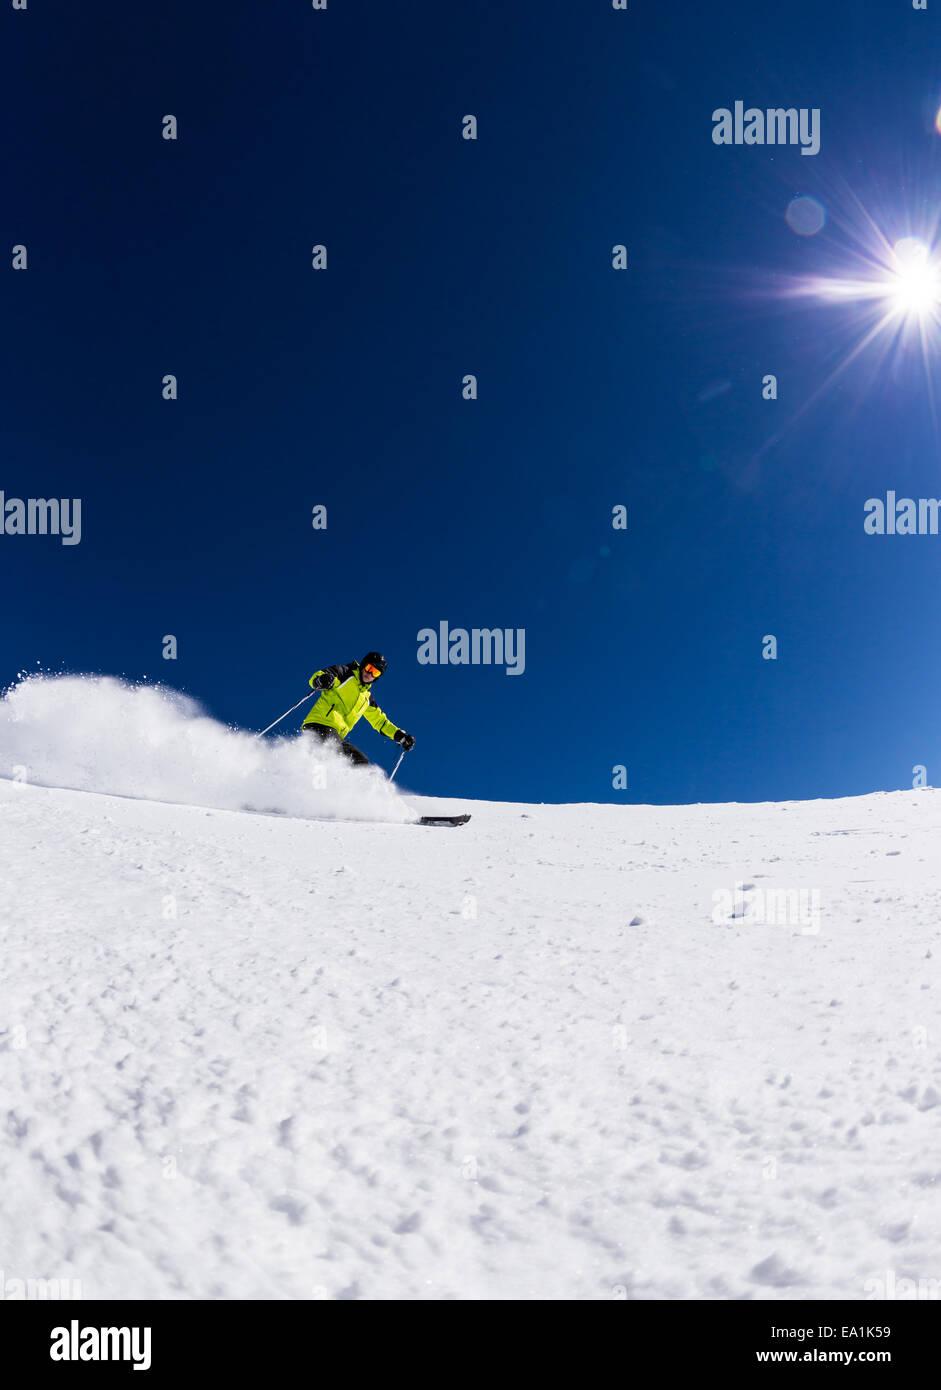 Alpine skier skiing downhill, blue sky on background - Stock Image